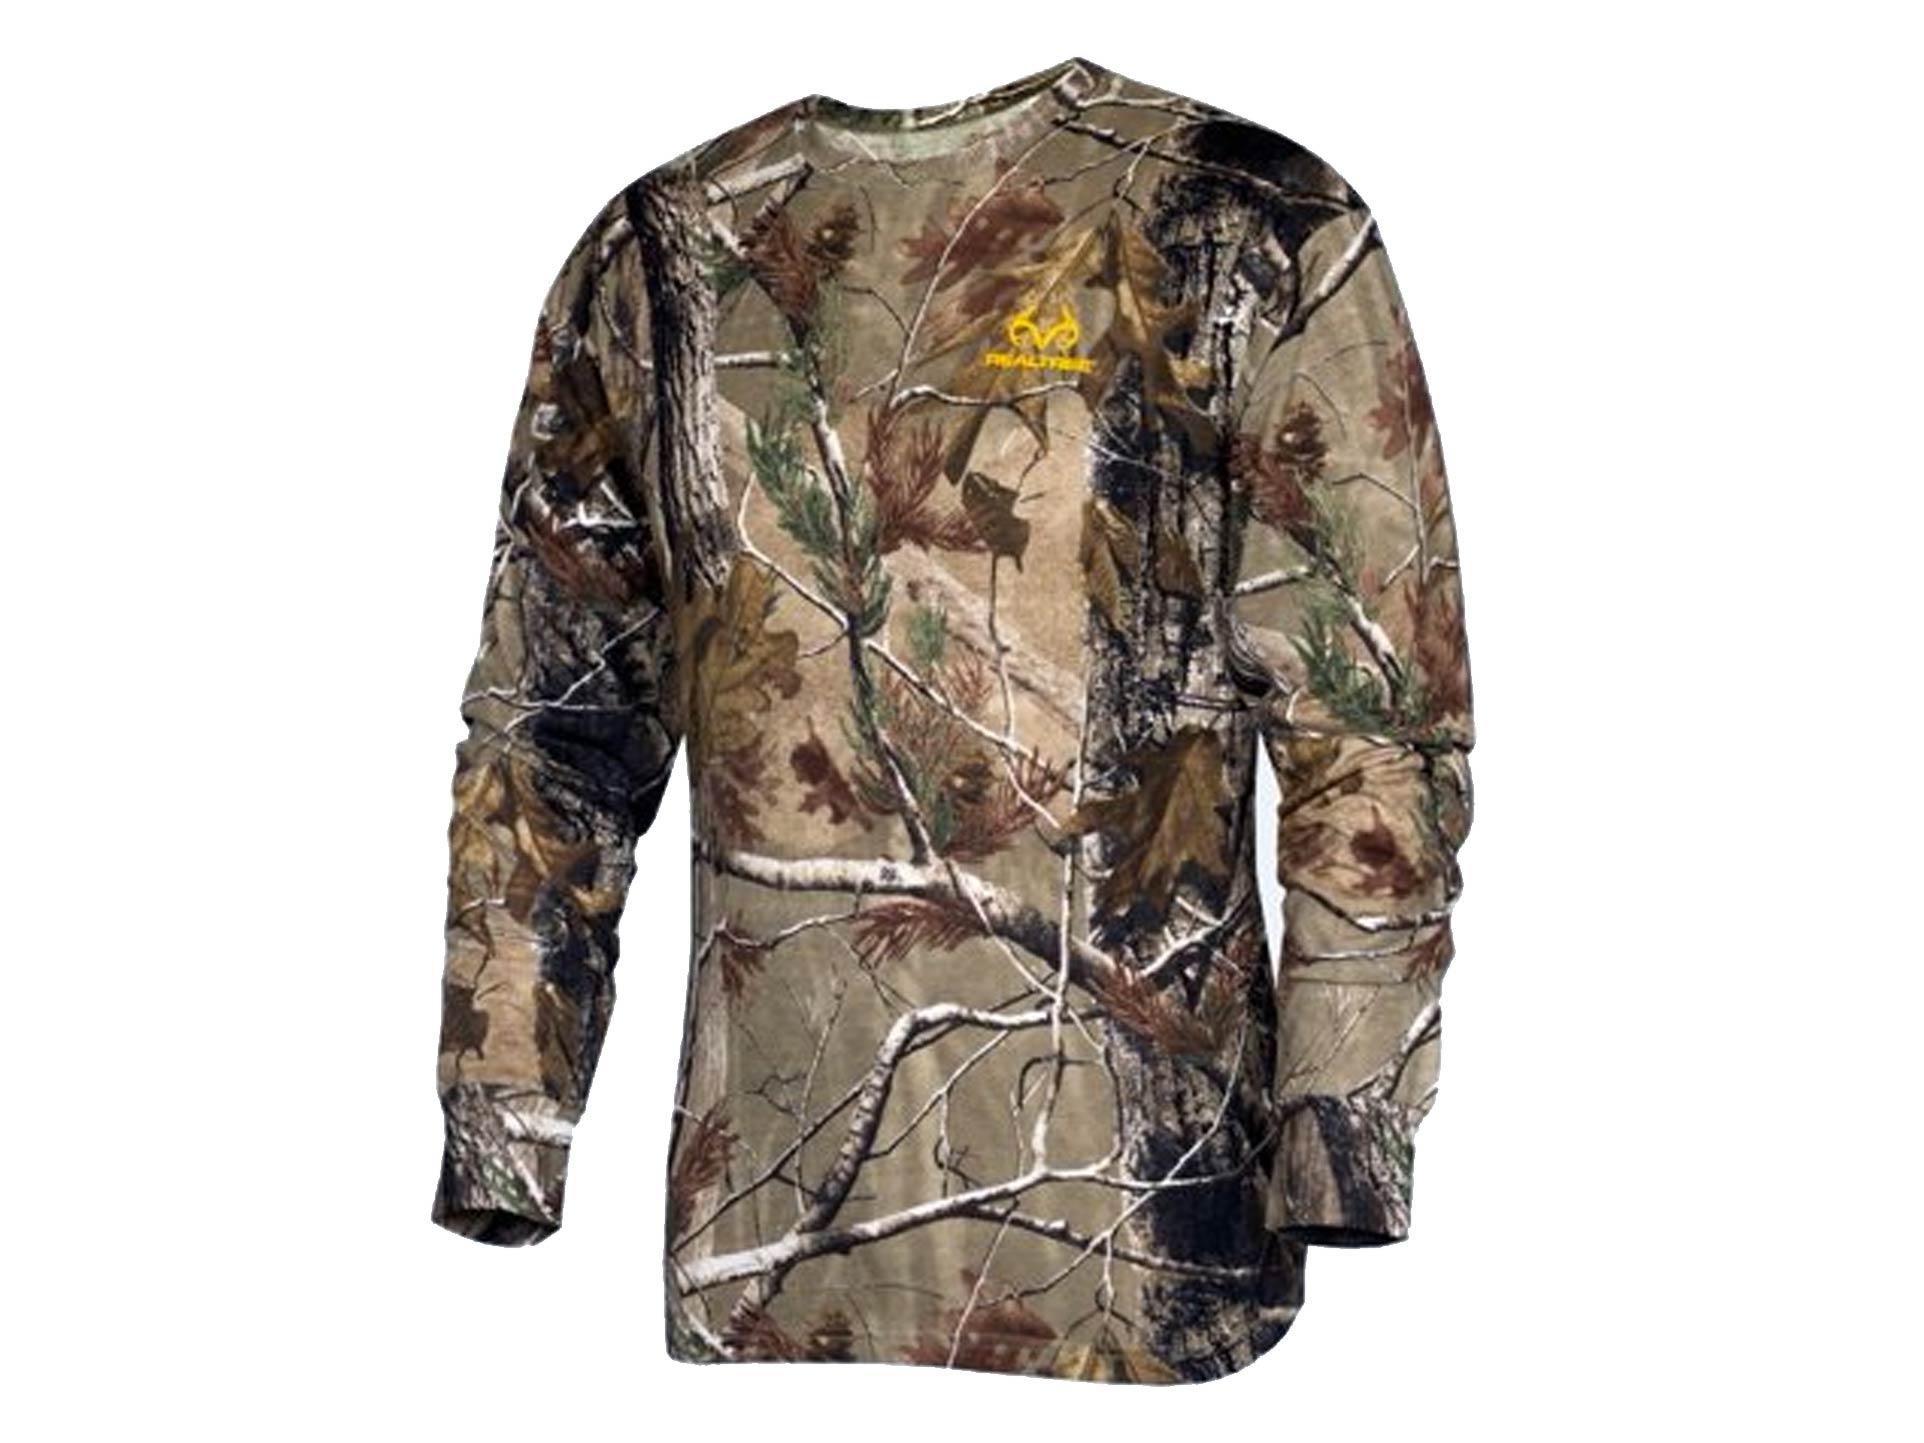 Men's Long Sleeve Tee Shirt - Realtree